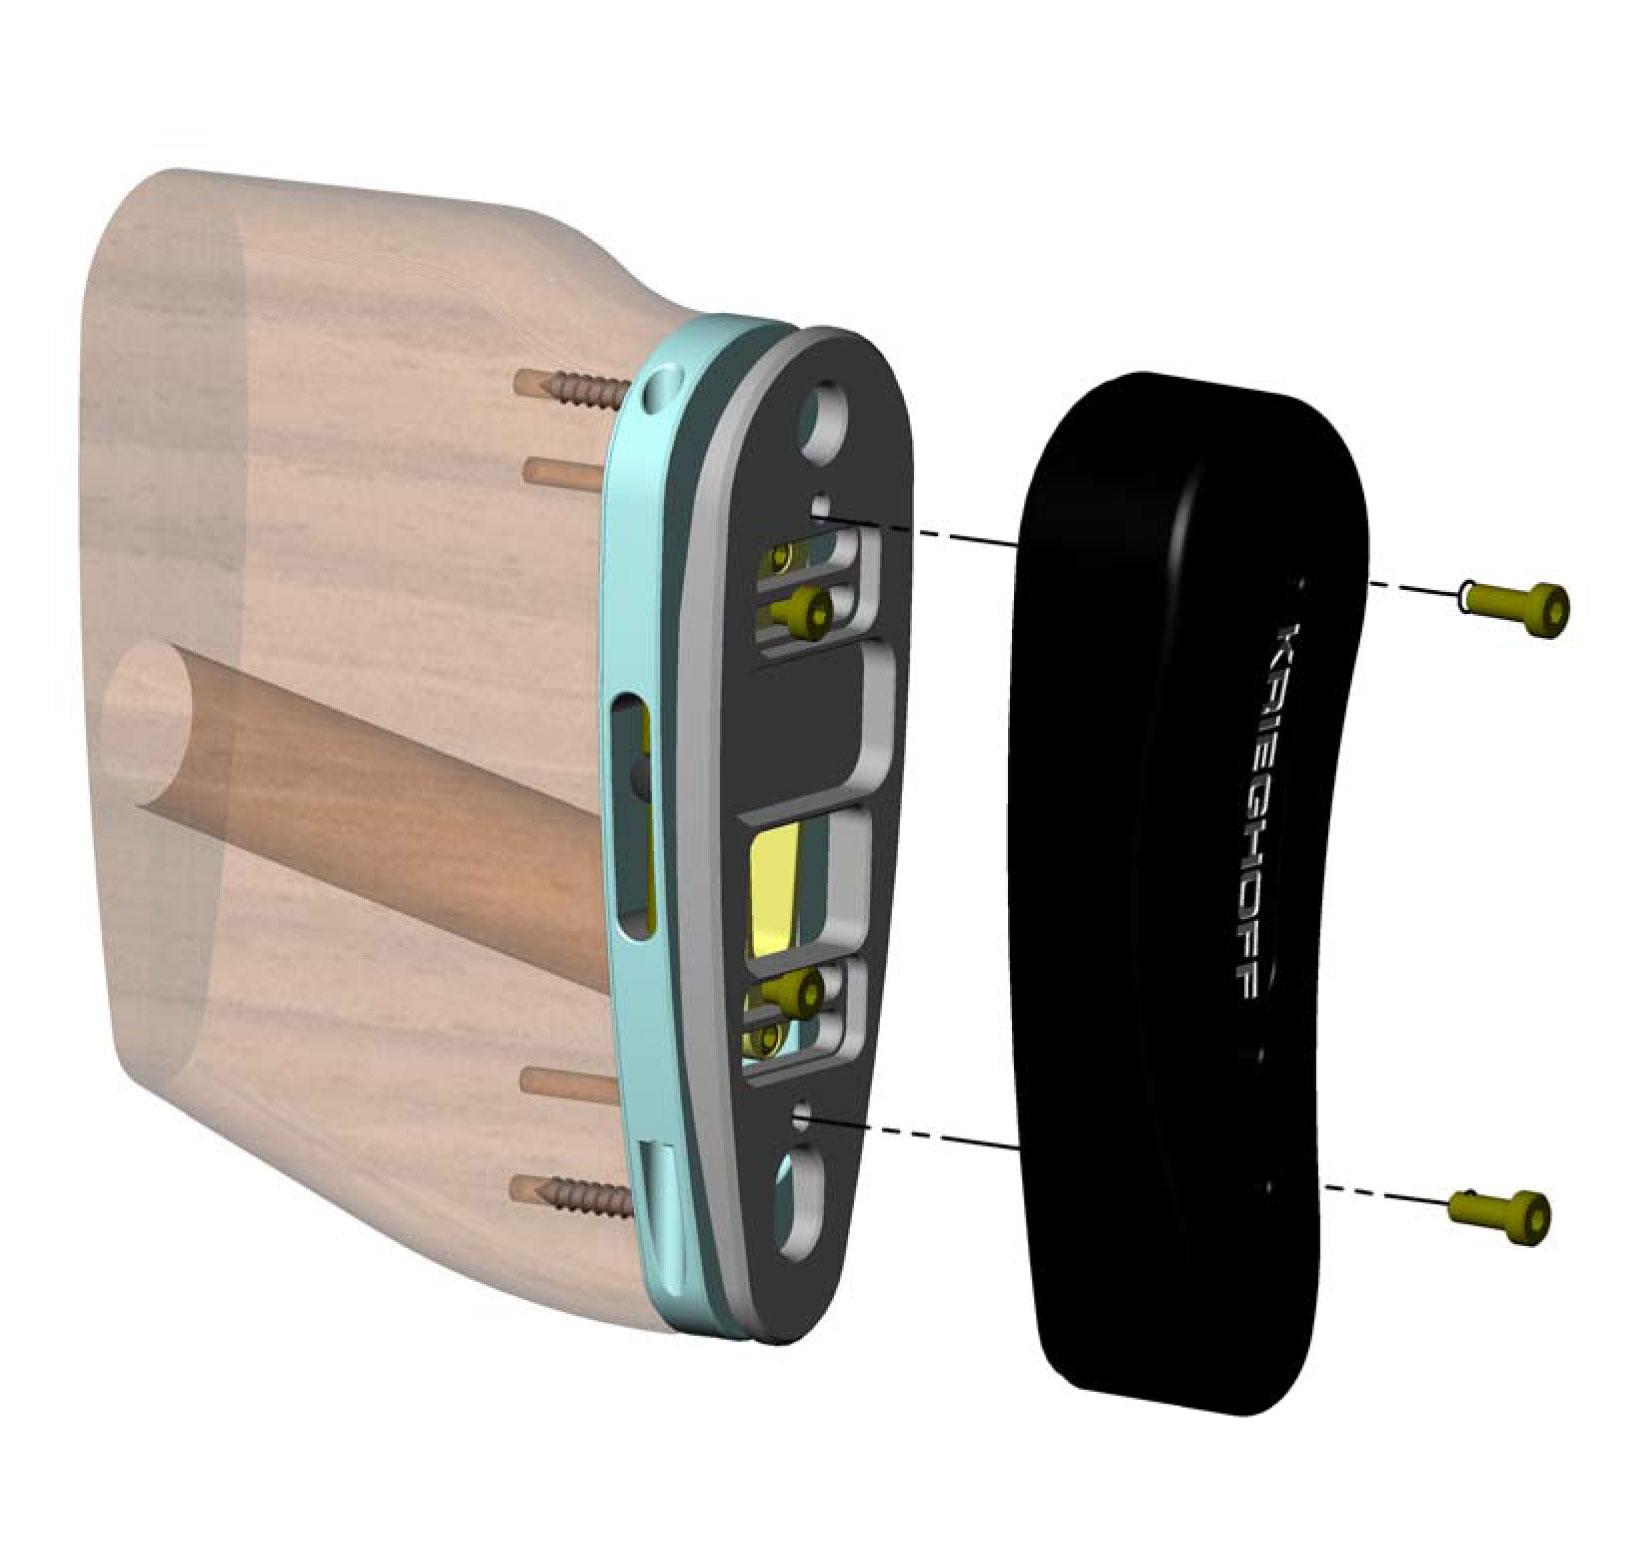 Krieghoff Adjustable Butt Pad